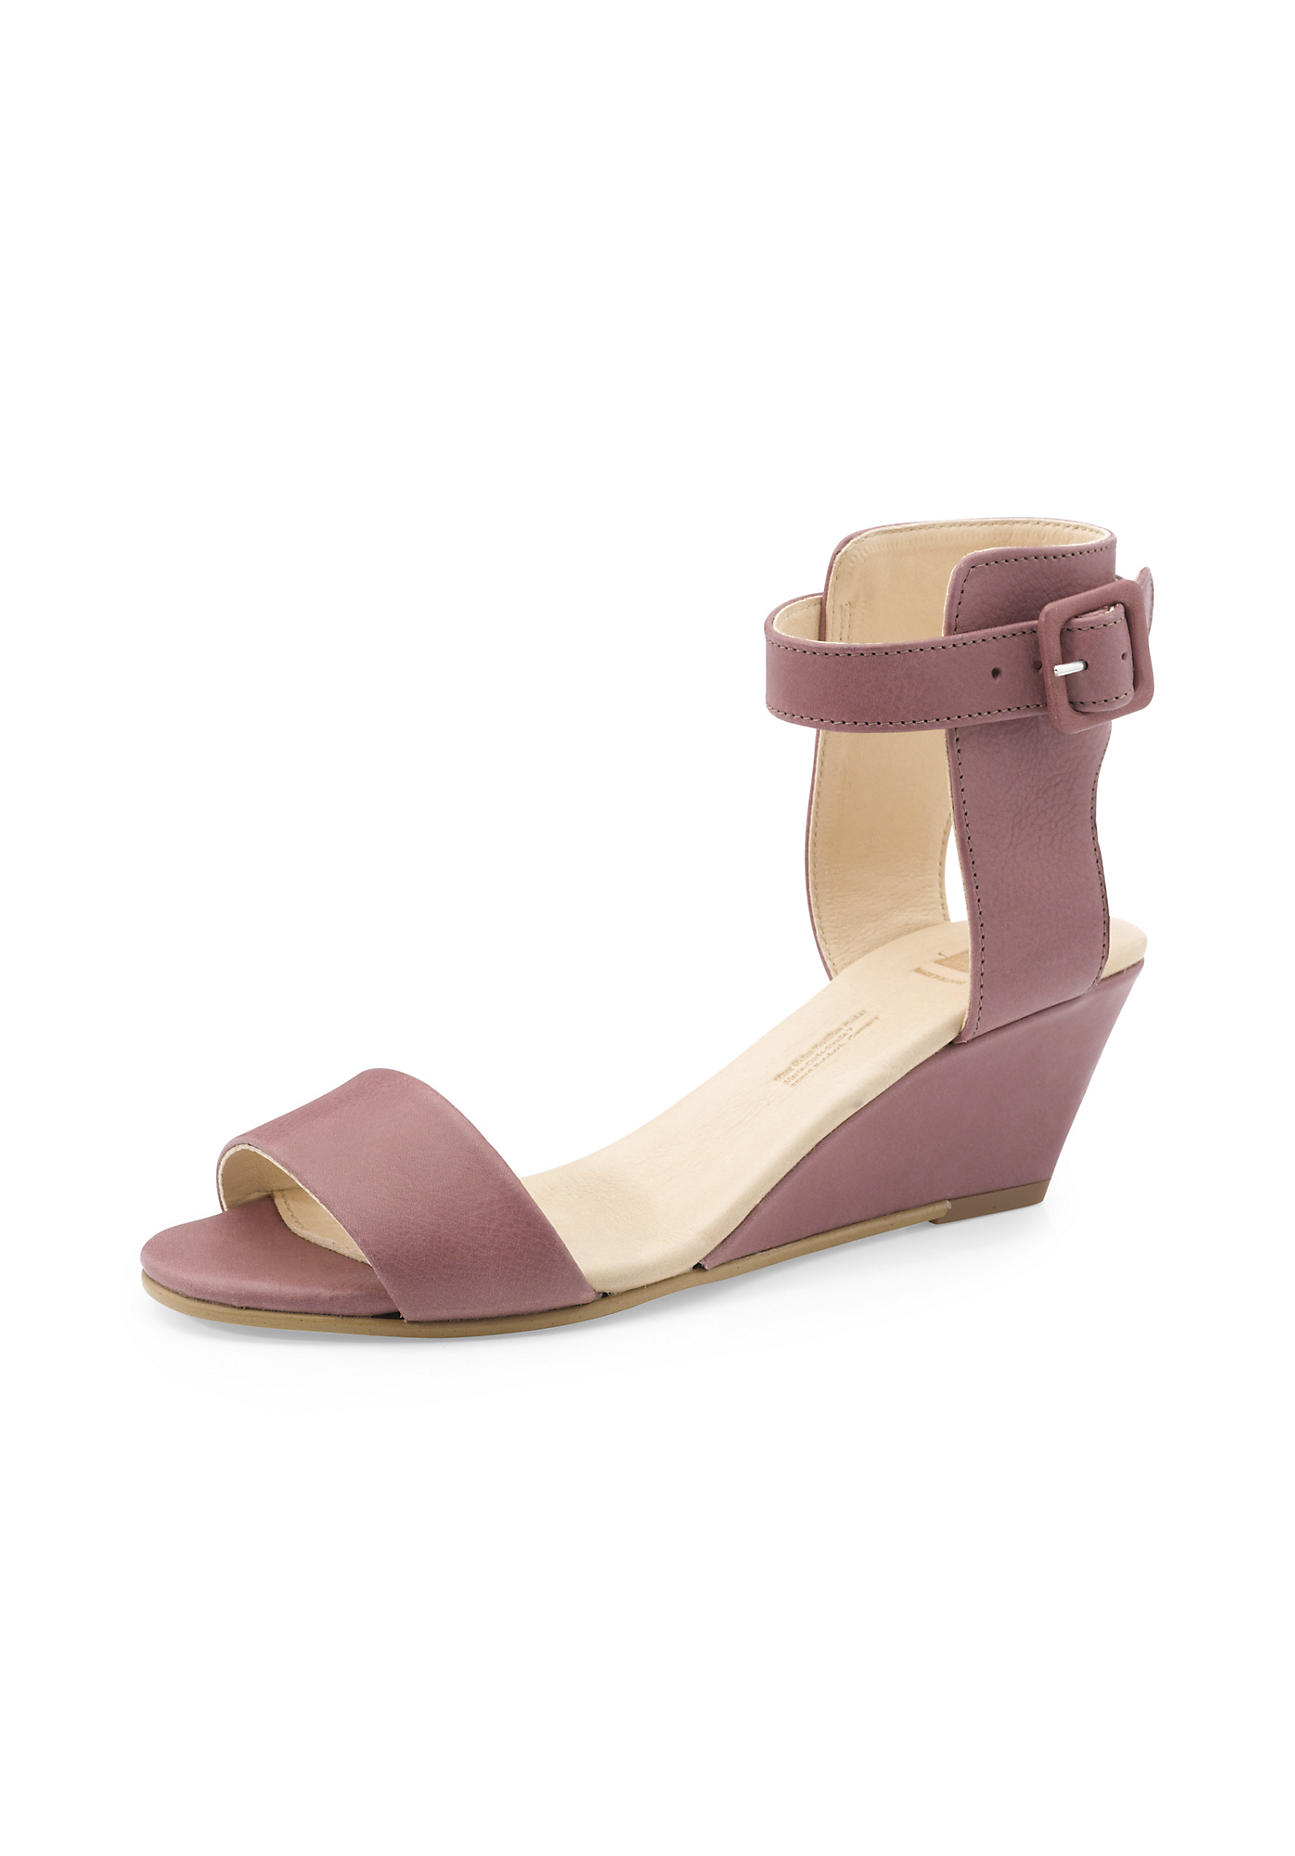 hessnatur Damen Damen Sandalette aus Leder – rosa – Größe 41